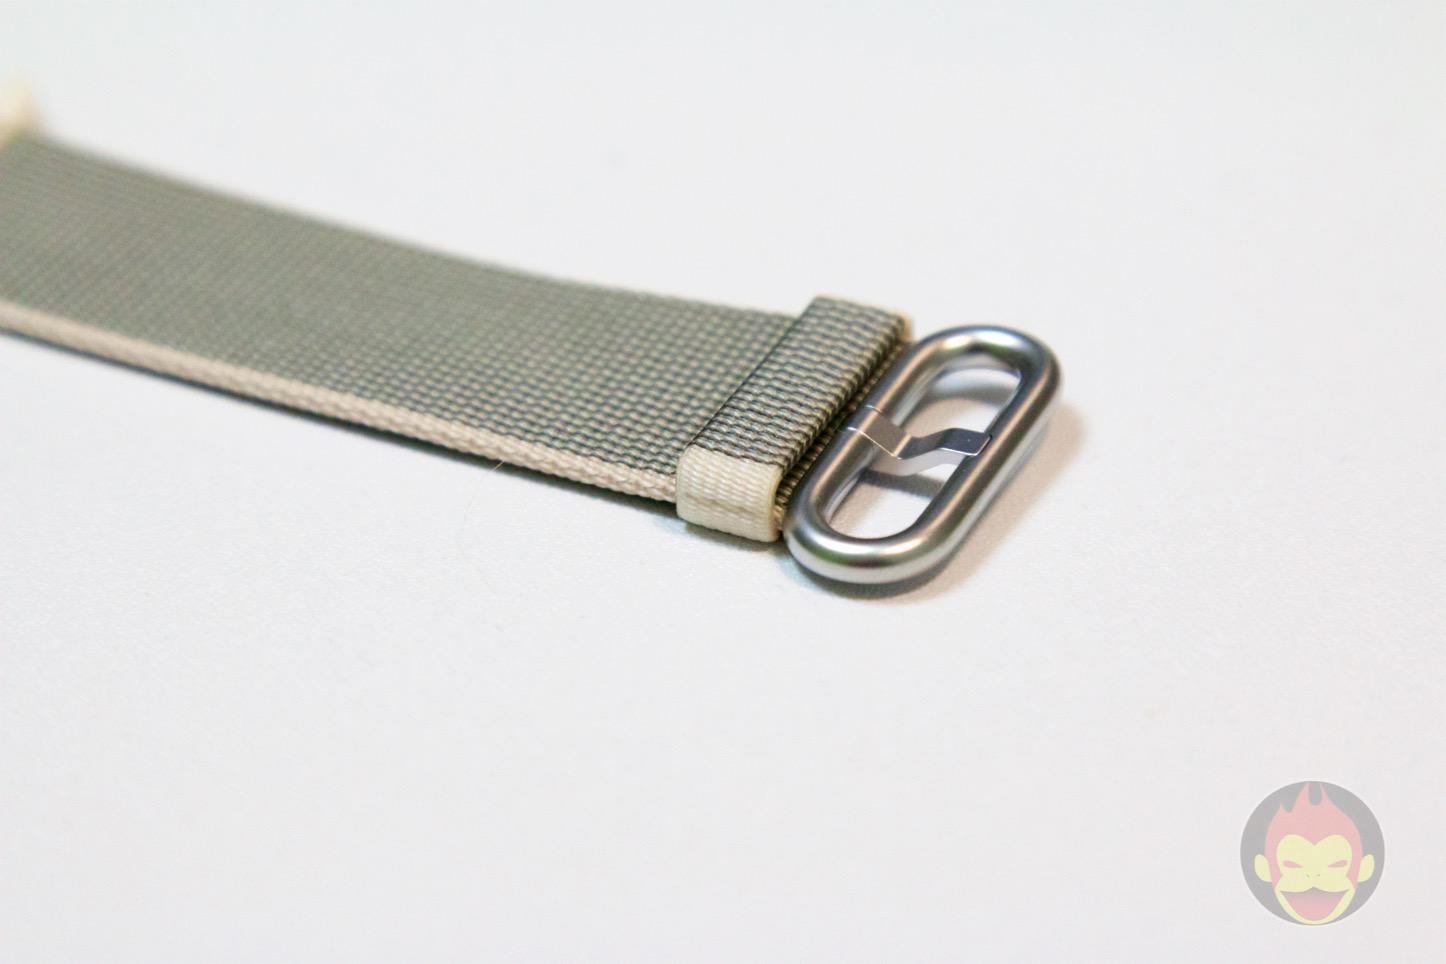 Apple-Watch-Woven-Nylon-Band-05.jpg